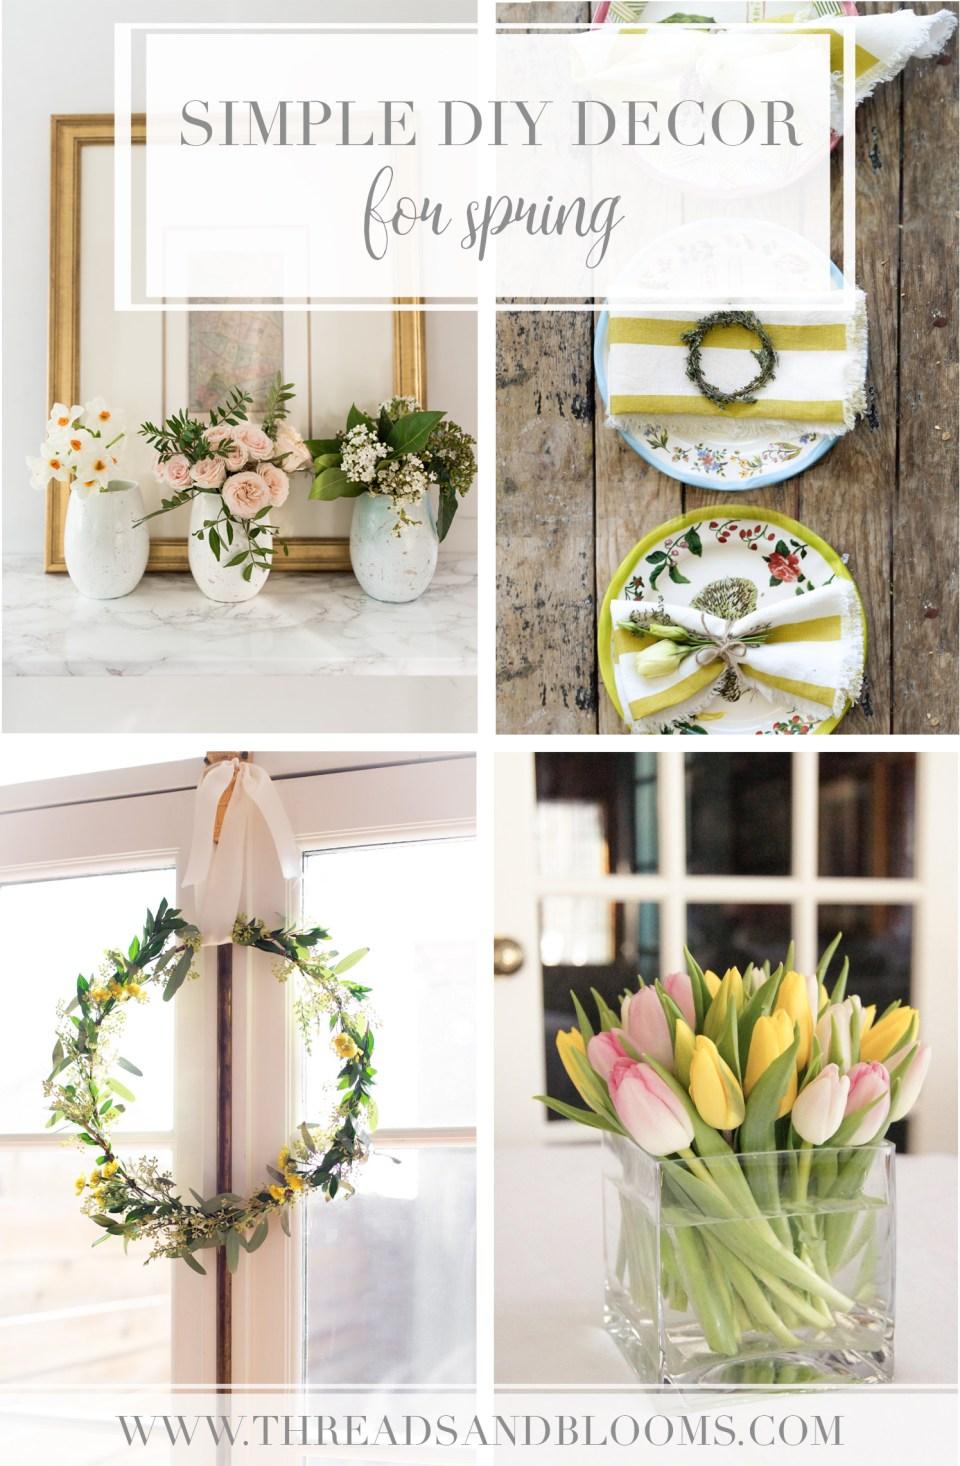 Easter Crafts & Spring Decor Ideas - Simple Spring DIYs